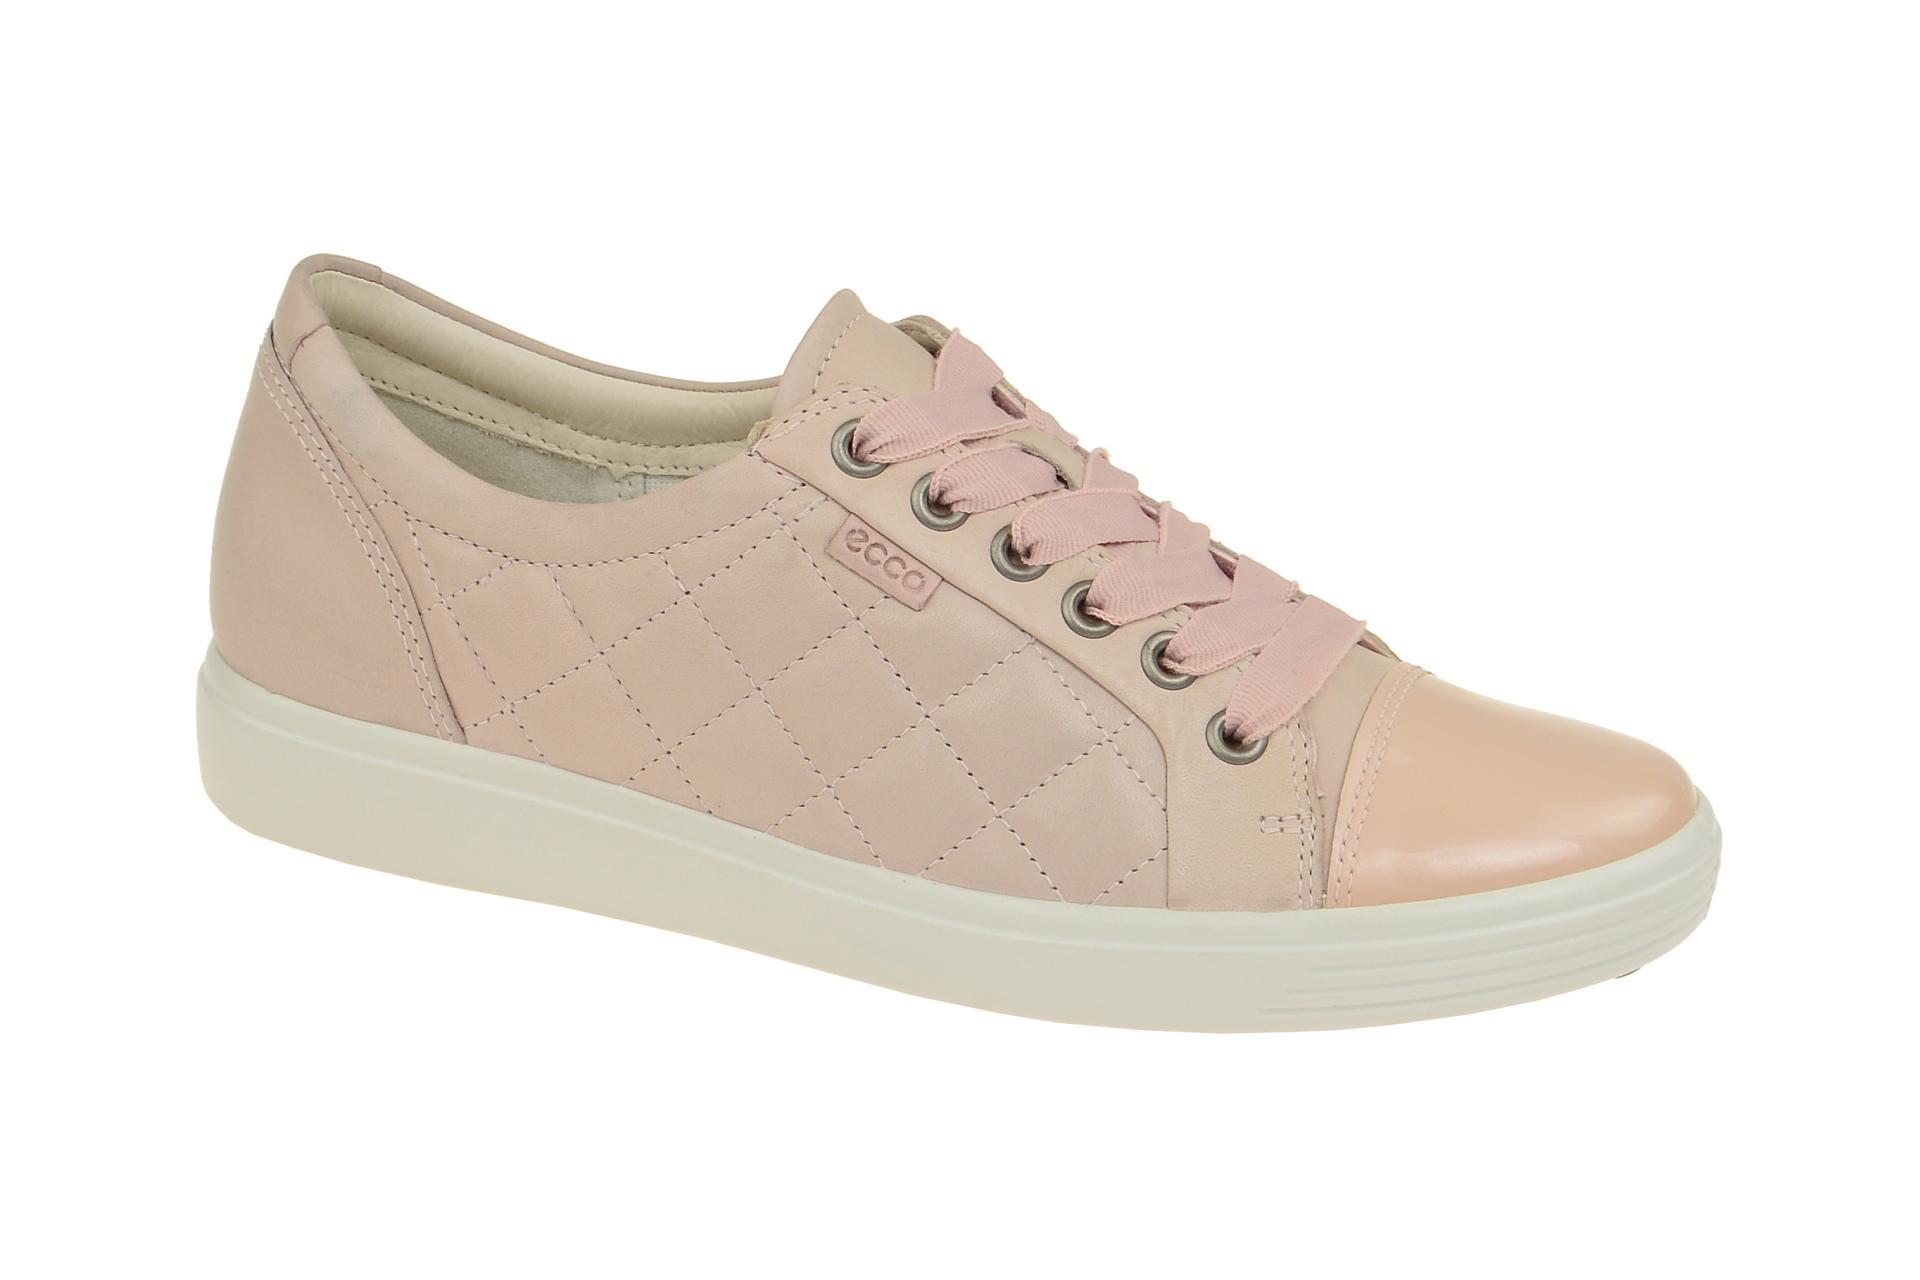 ecco soft 7 schuhe rosa sneakers gr 39 schuhhaus strauch shop. Black Bedroom Furniture Sets. Home Design Ideas